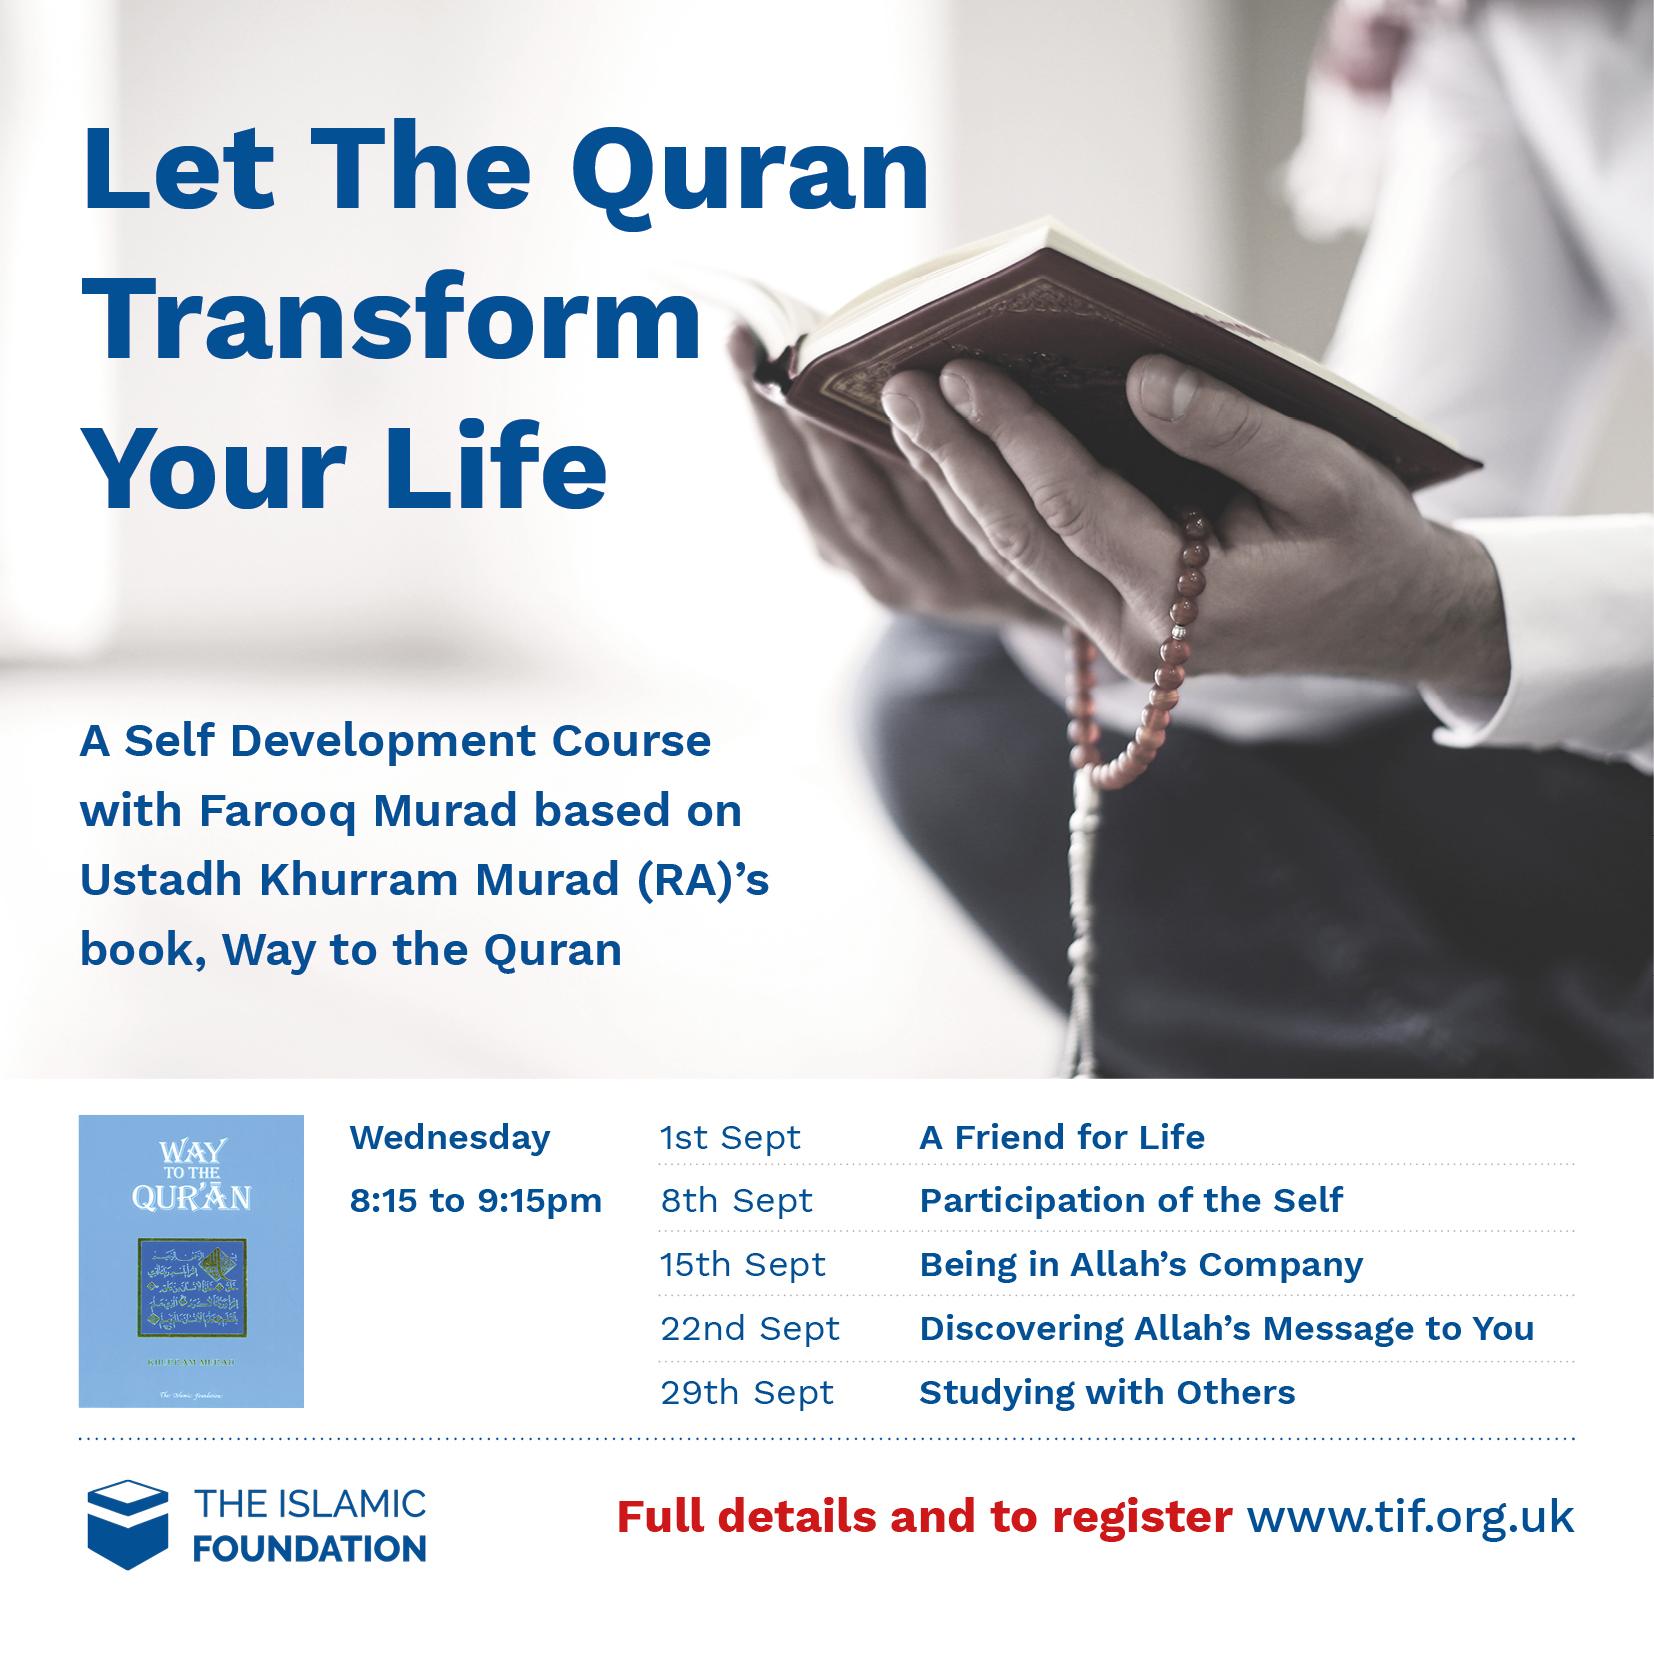 Let the Quran Transform Your Life